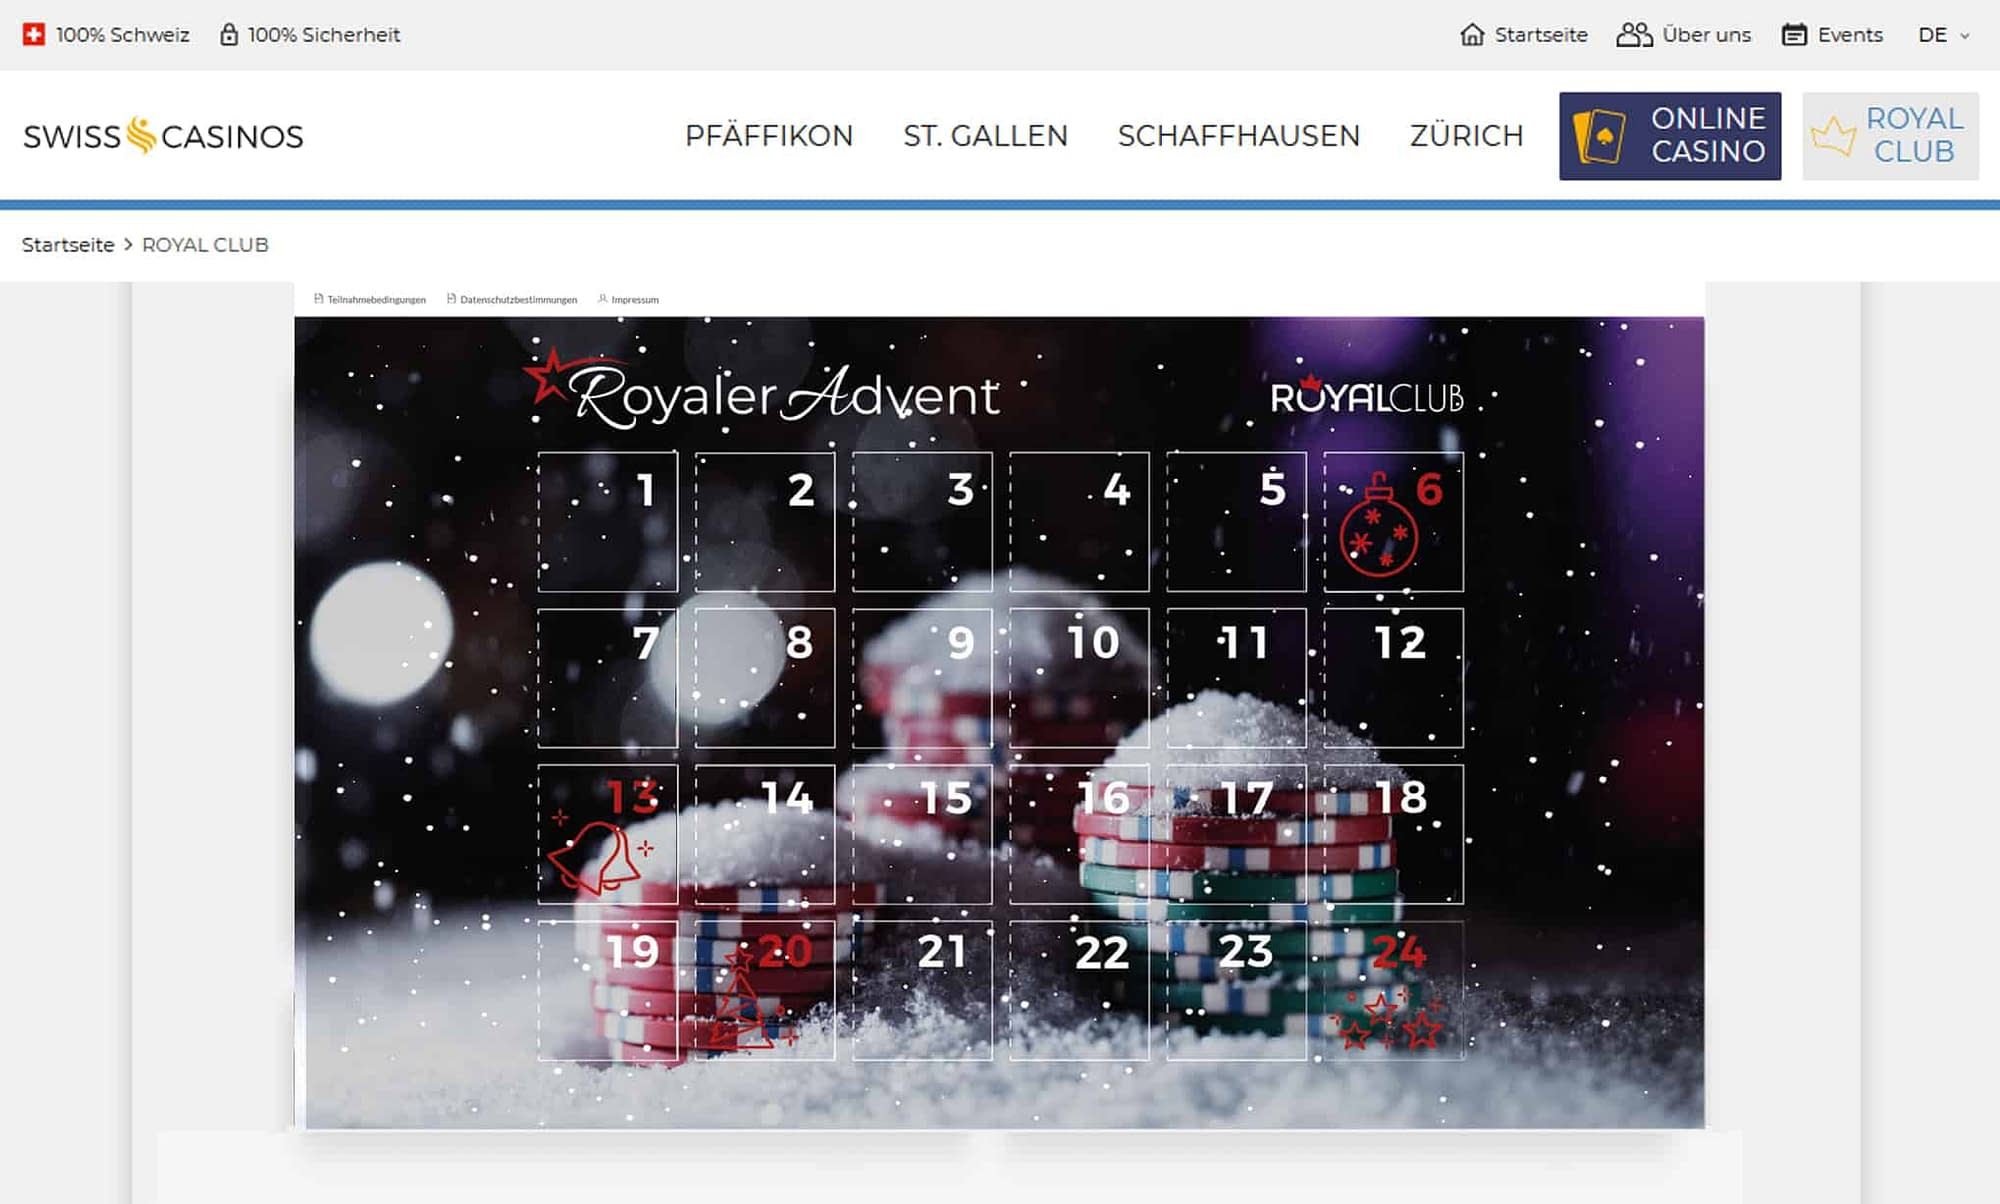 Swiss Casino Adventskalender Webseite Kampagne